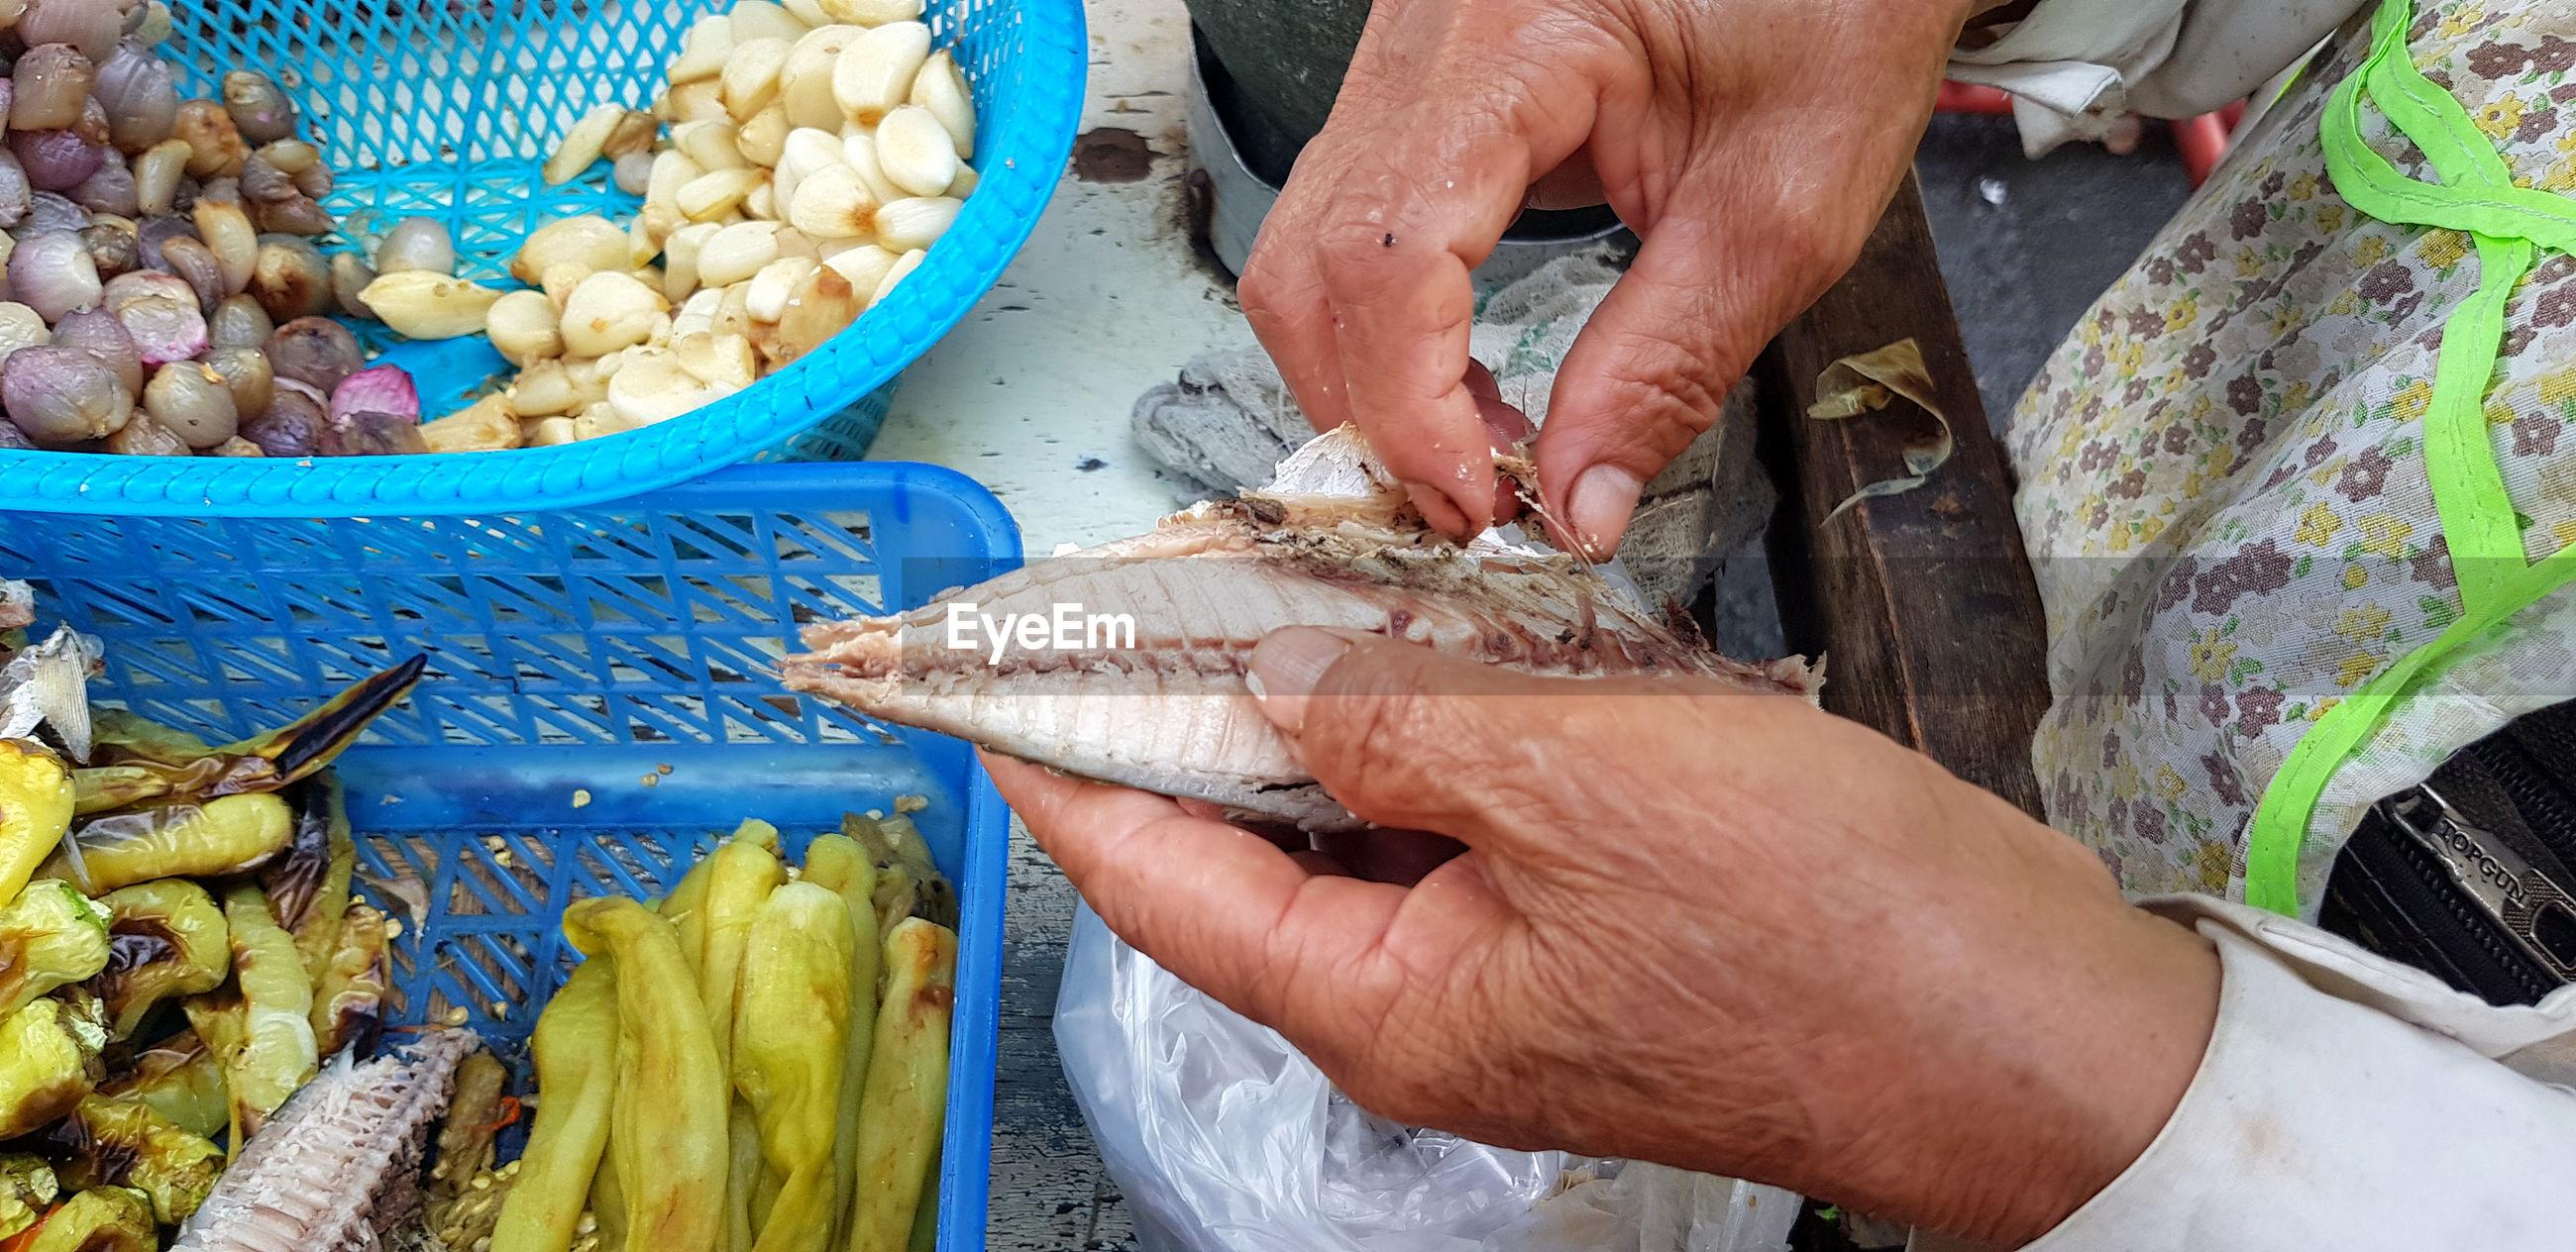 Midsection of man preparing food at street market